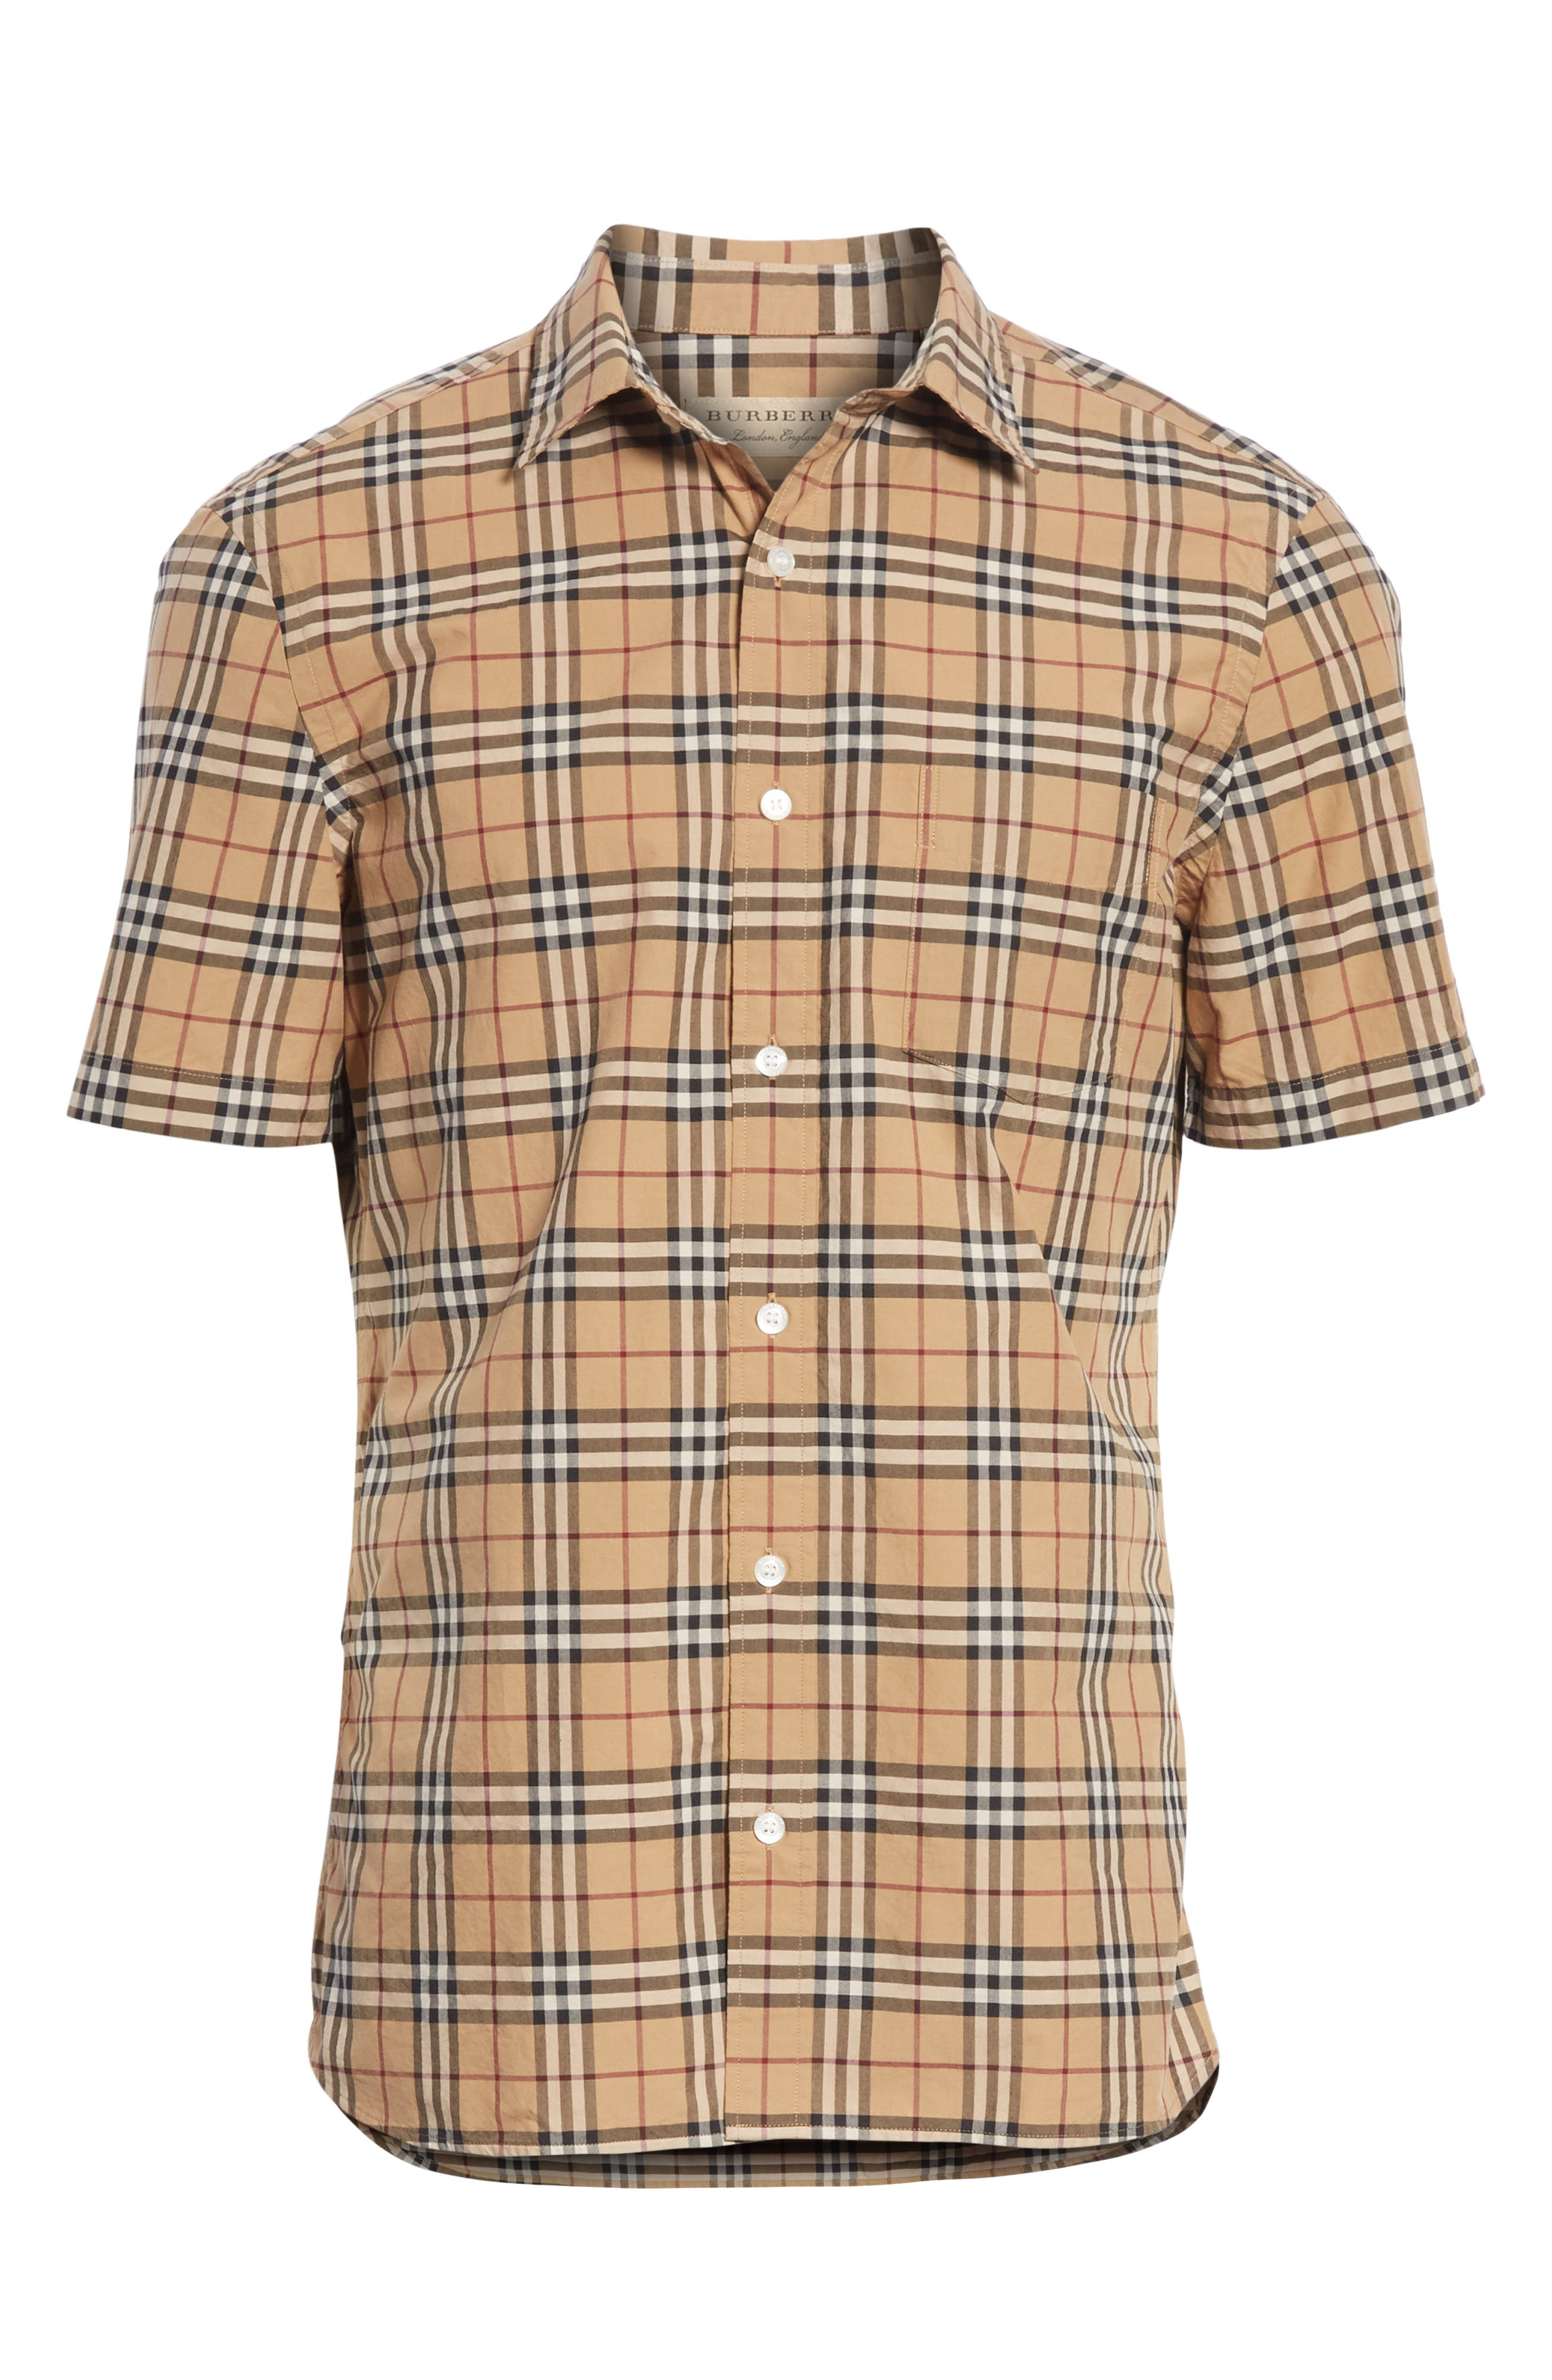 Alexander Check Sport Shirt,                             Alternate thumbnail 6, color,                             CAMEL